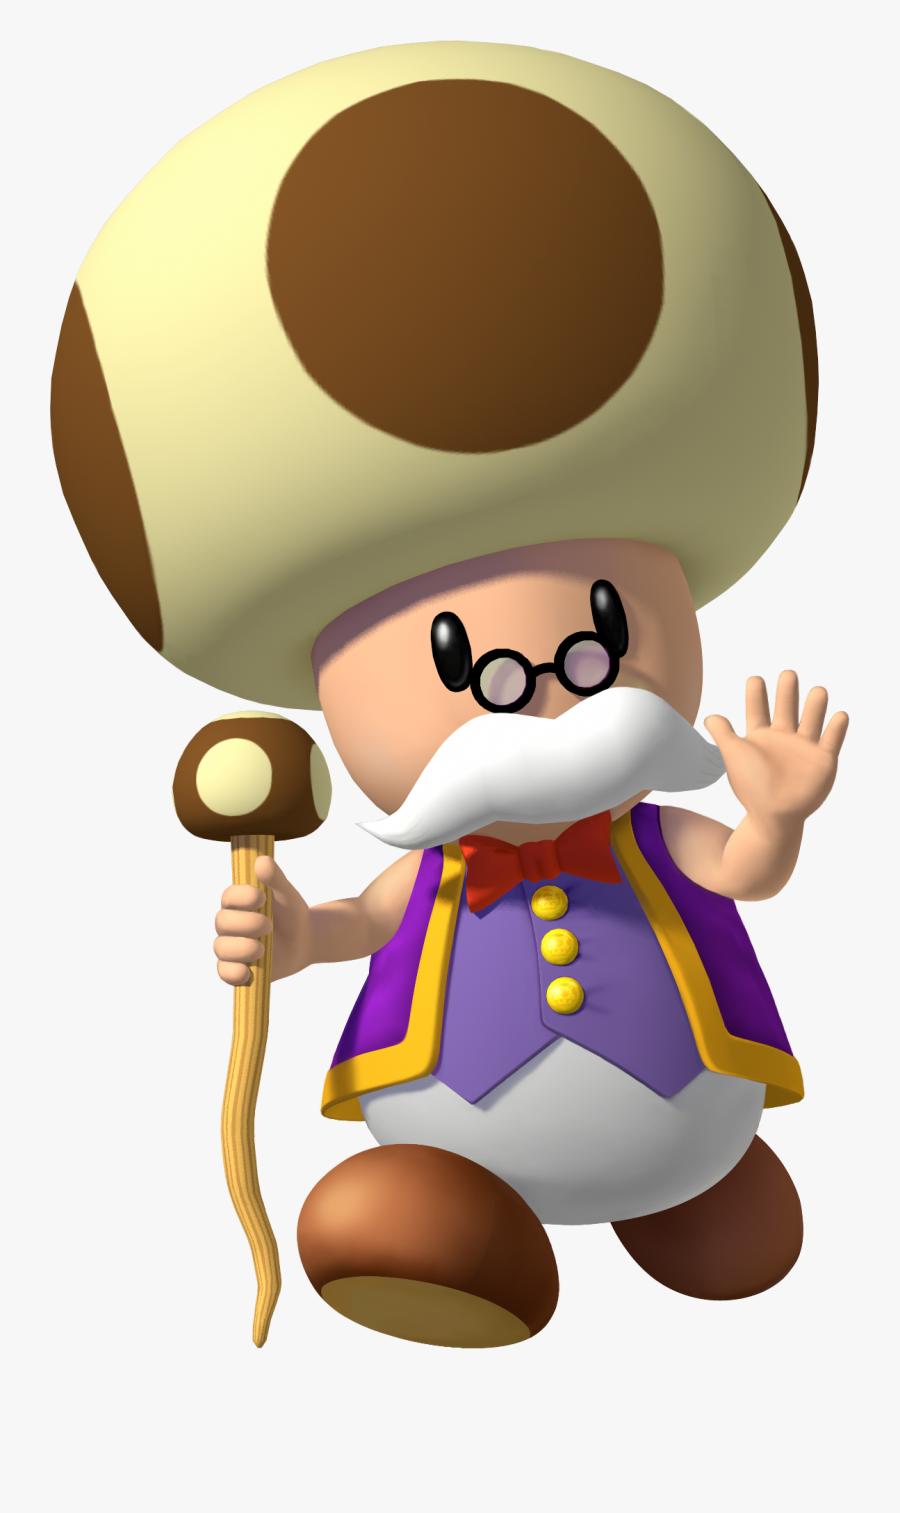 Since Super Mario Bros - Super Mario Old Toad, Transparent Clipart